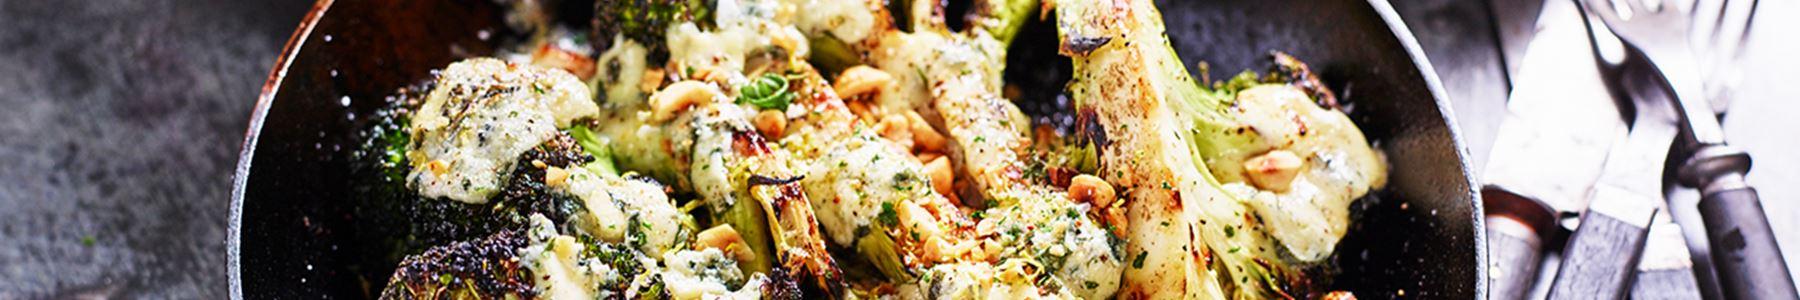 GI-metoden + Broccoli + Grillad